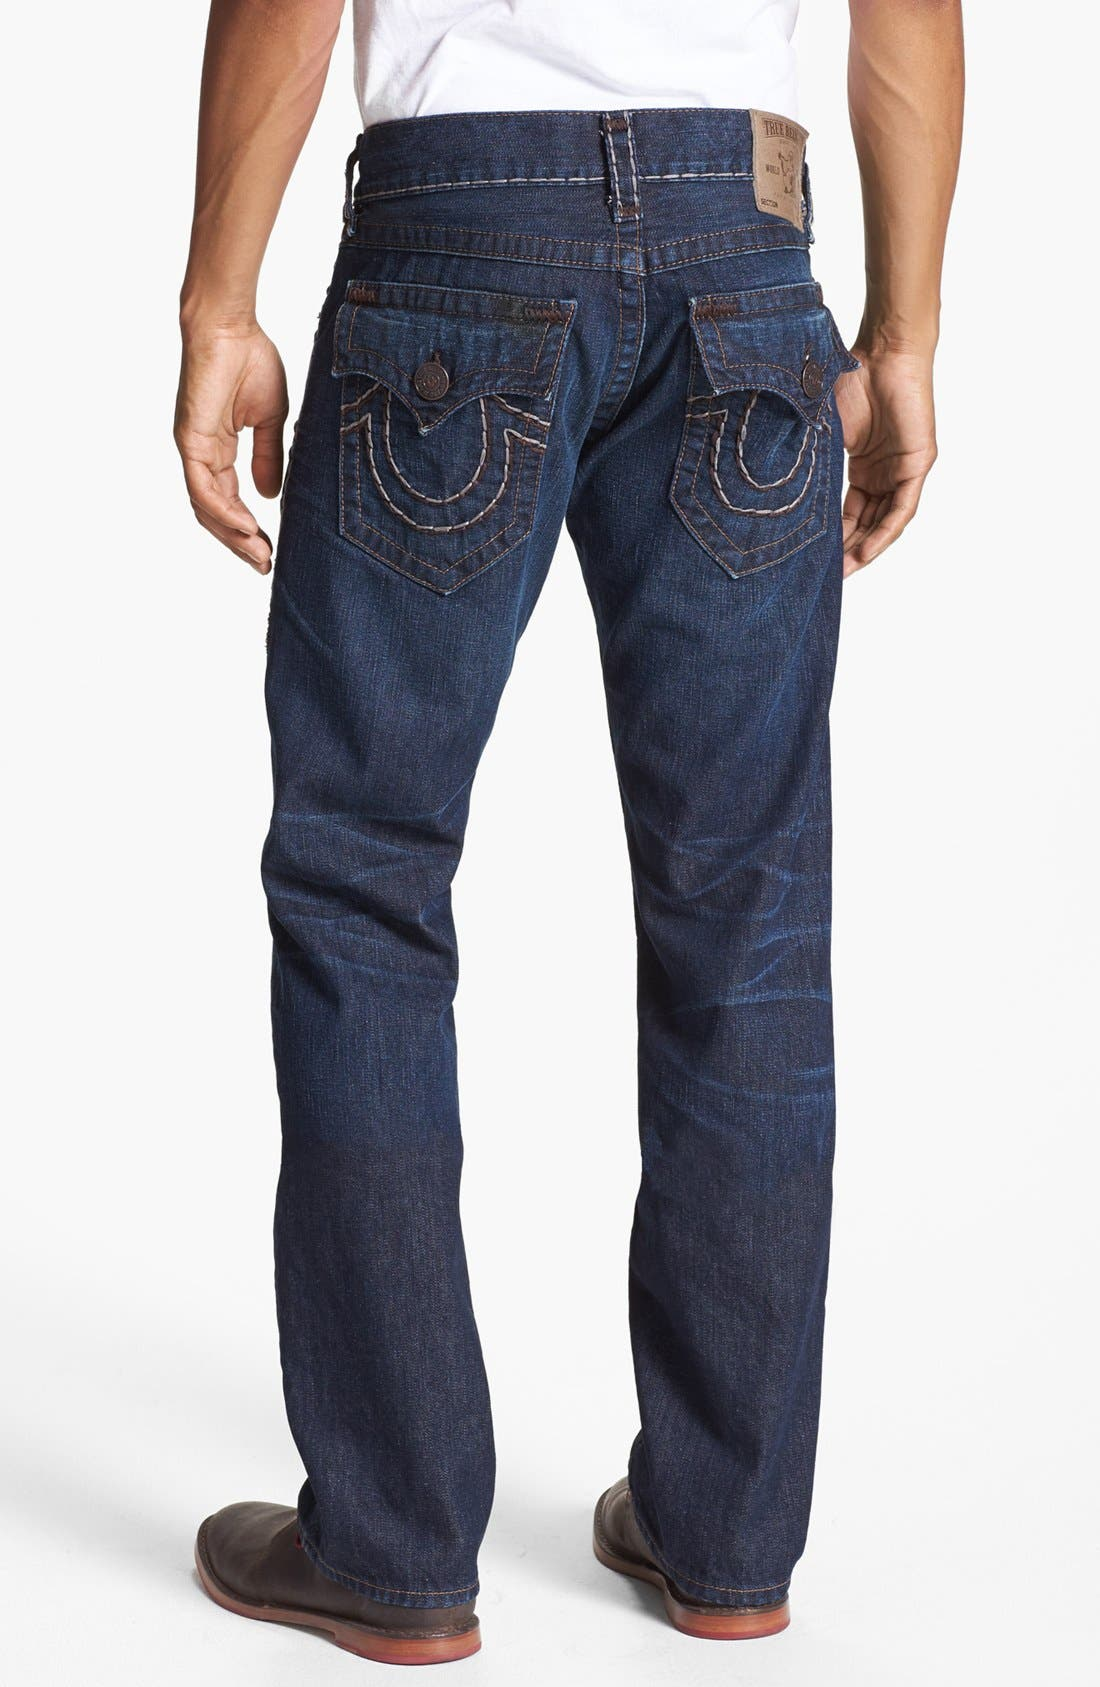 Main Image - True Religion Brand Jeans 'Ricky' Straight Leg Jeans (Retribution)